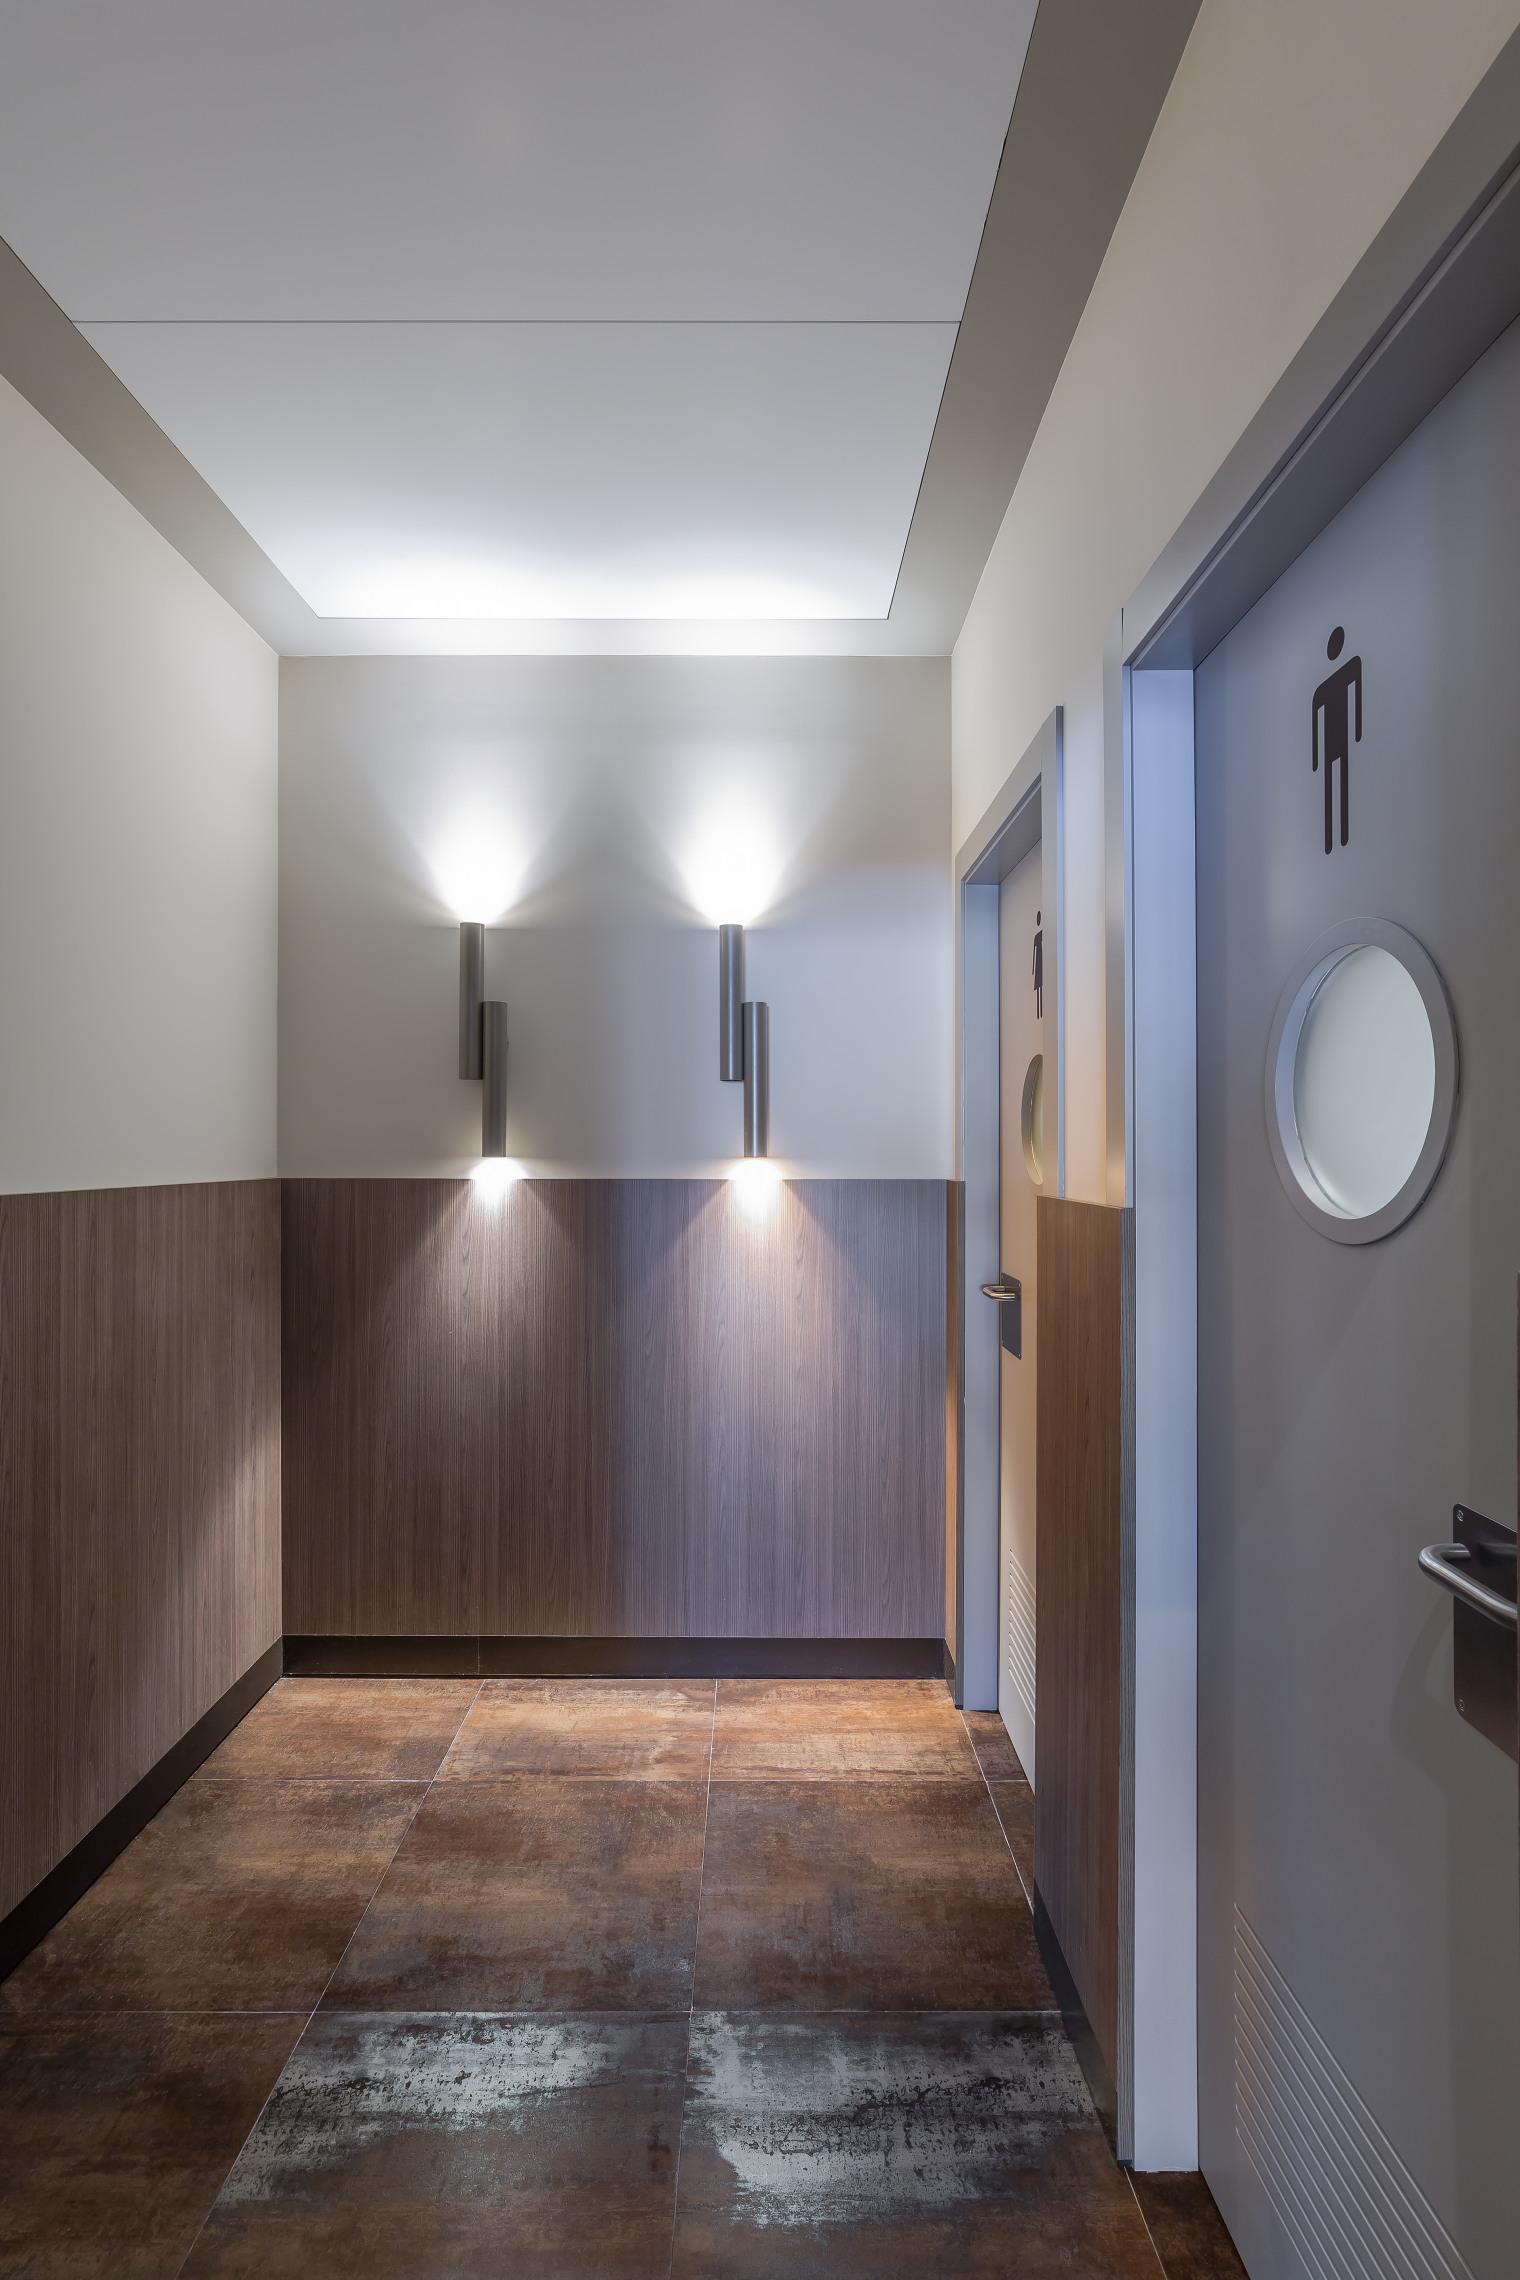 fotografia-arquitectura-valencia-german-cabo-bfm-edificatoria-vipsmart-aqua (13)